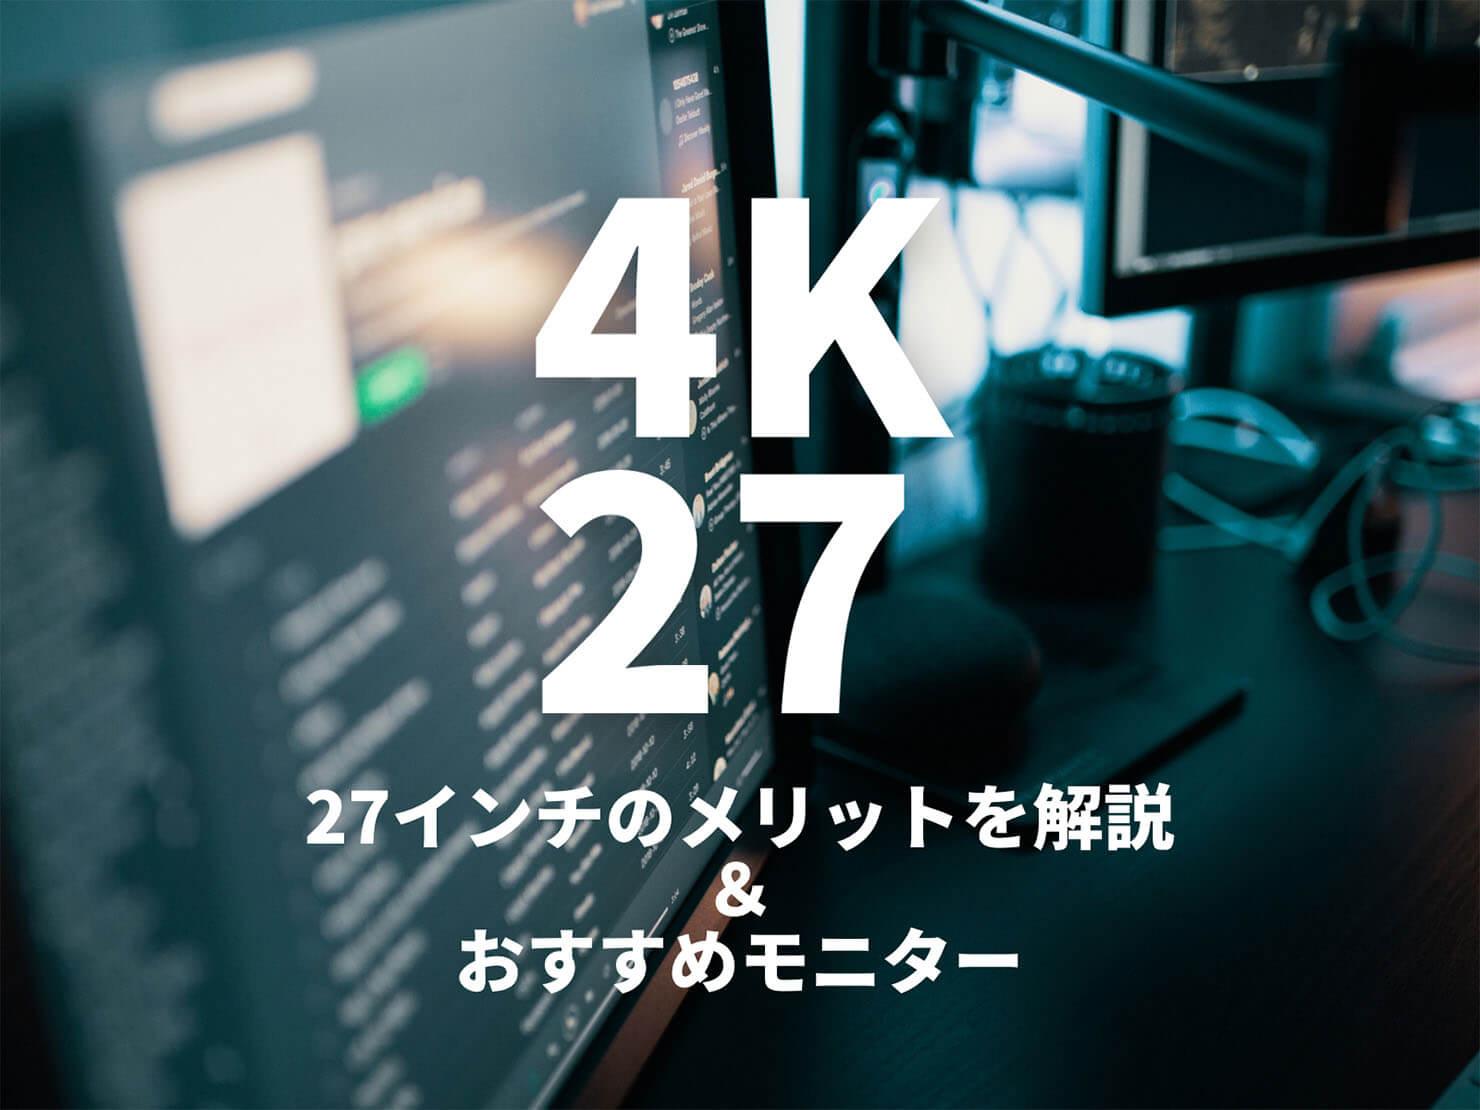 4k 32 インチ